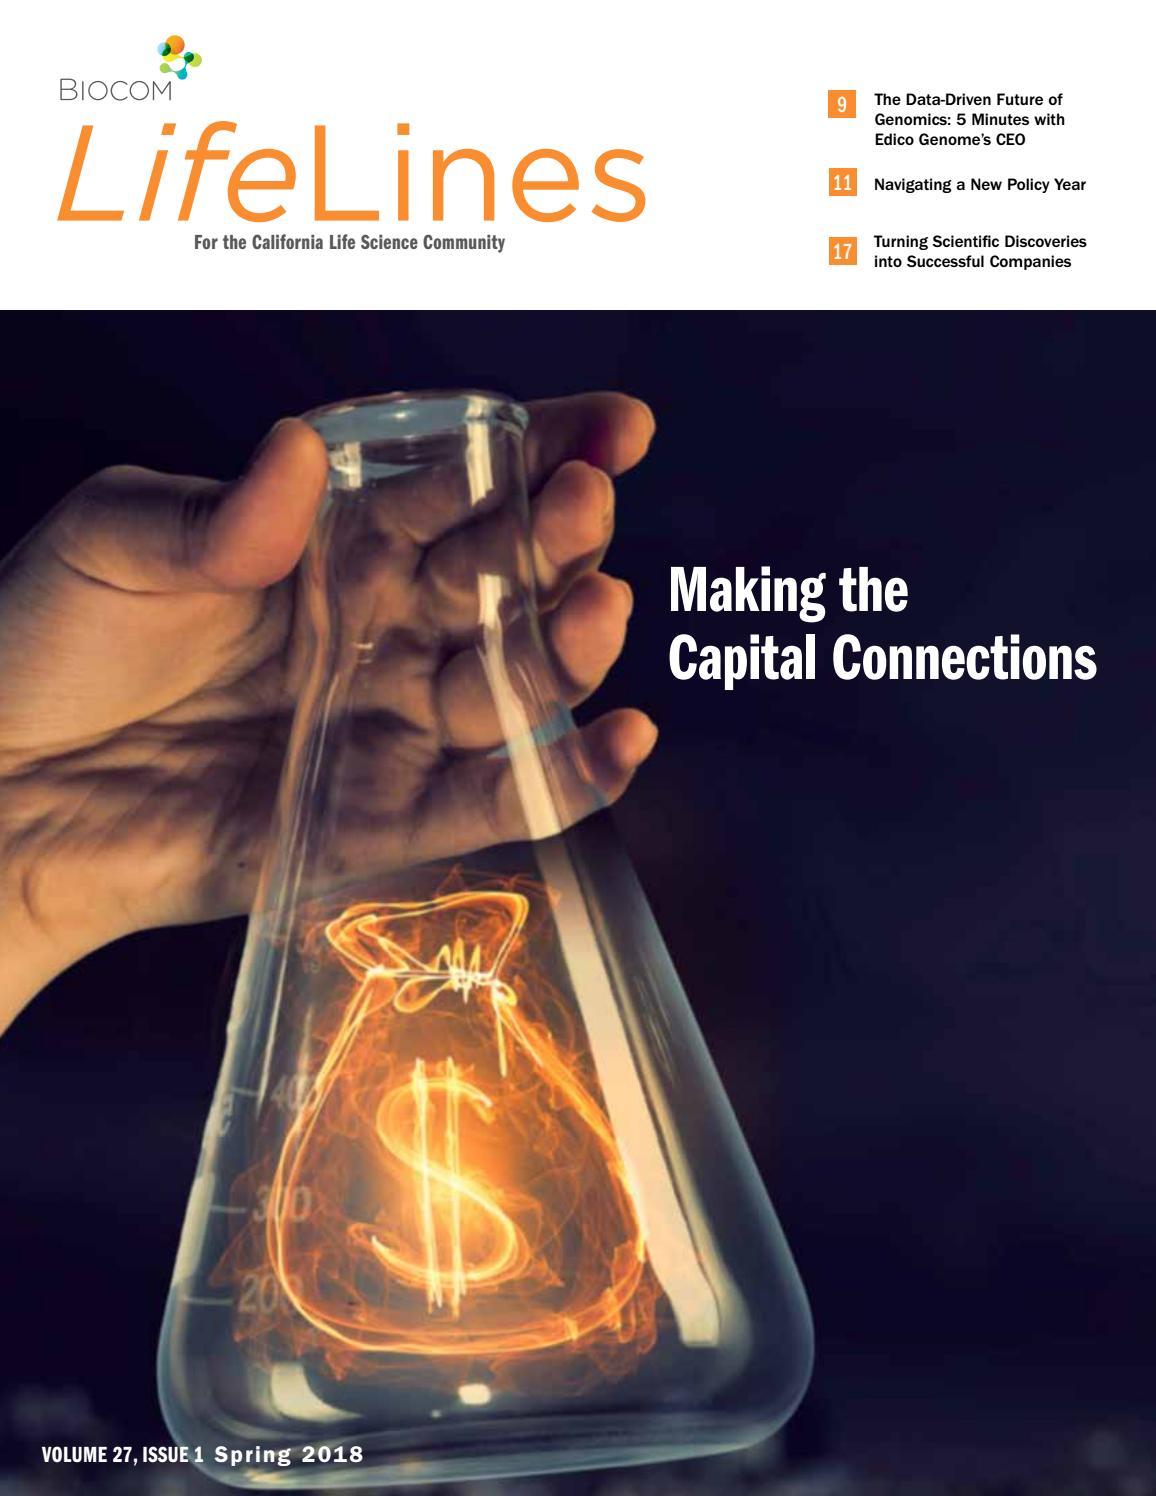 Biocom LifeLines - Spring 2018 by Biocom - issuu